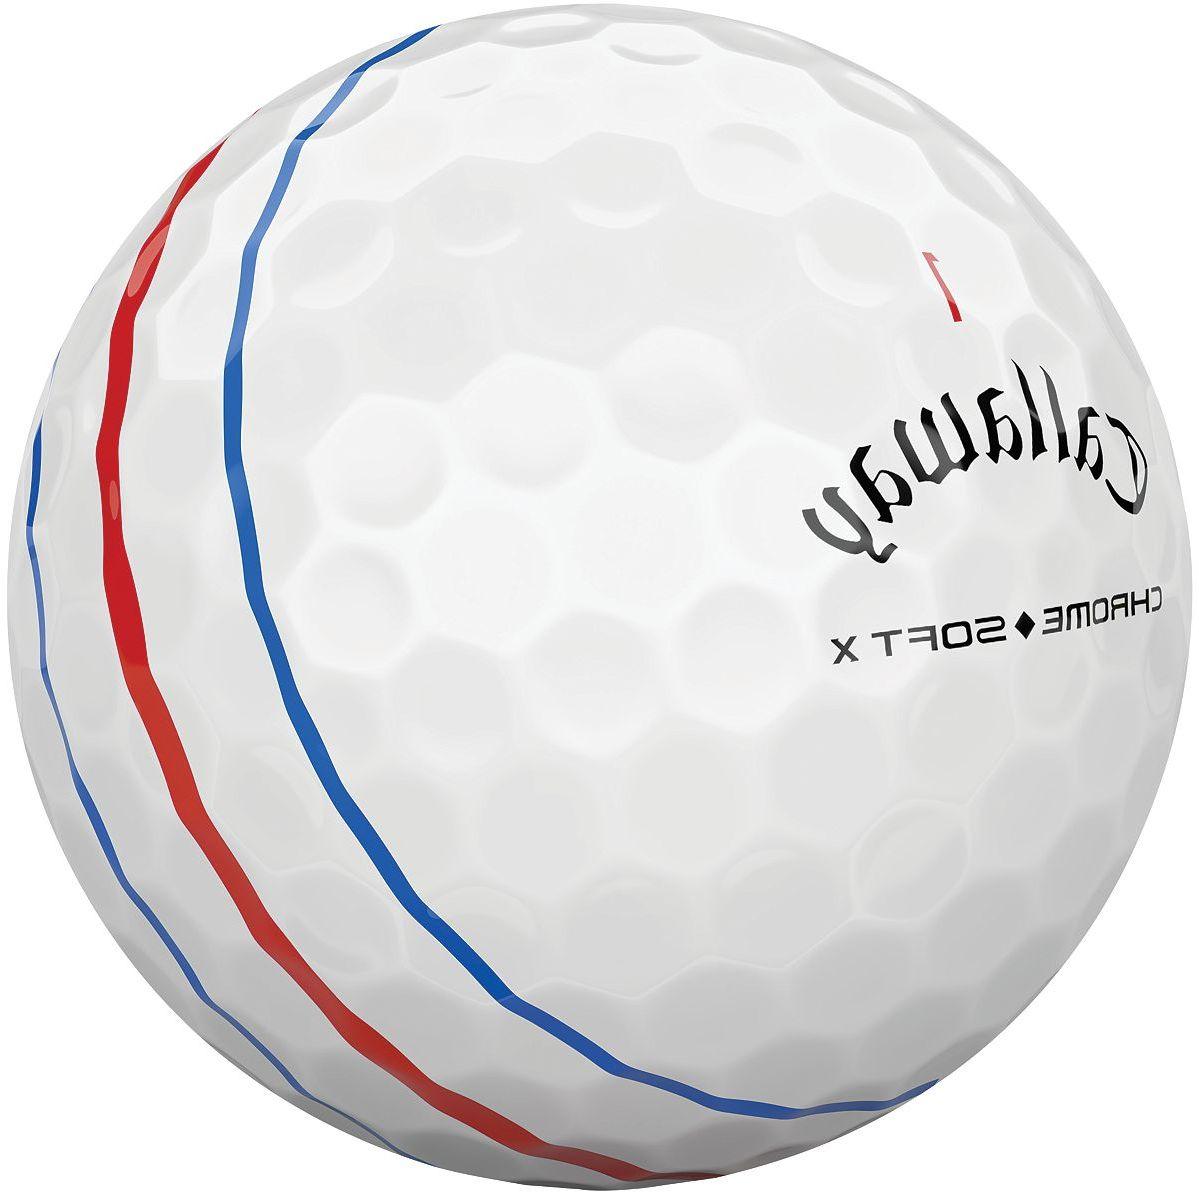 Callaway 2018 Chrome Soft X Triple Track Golf Balls